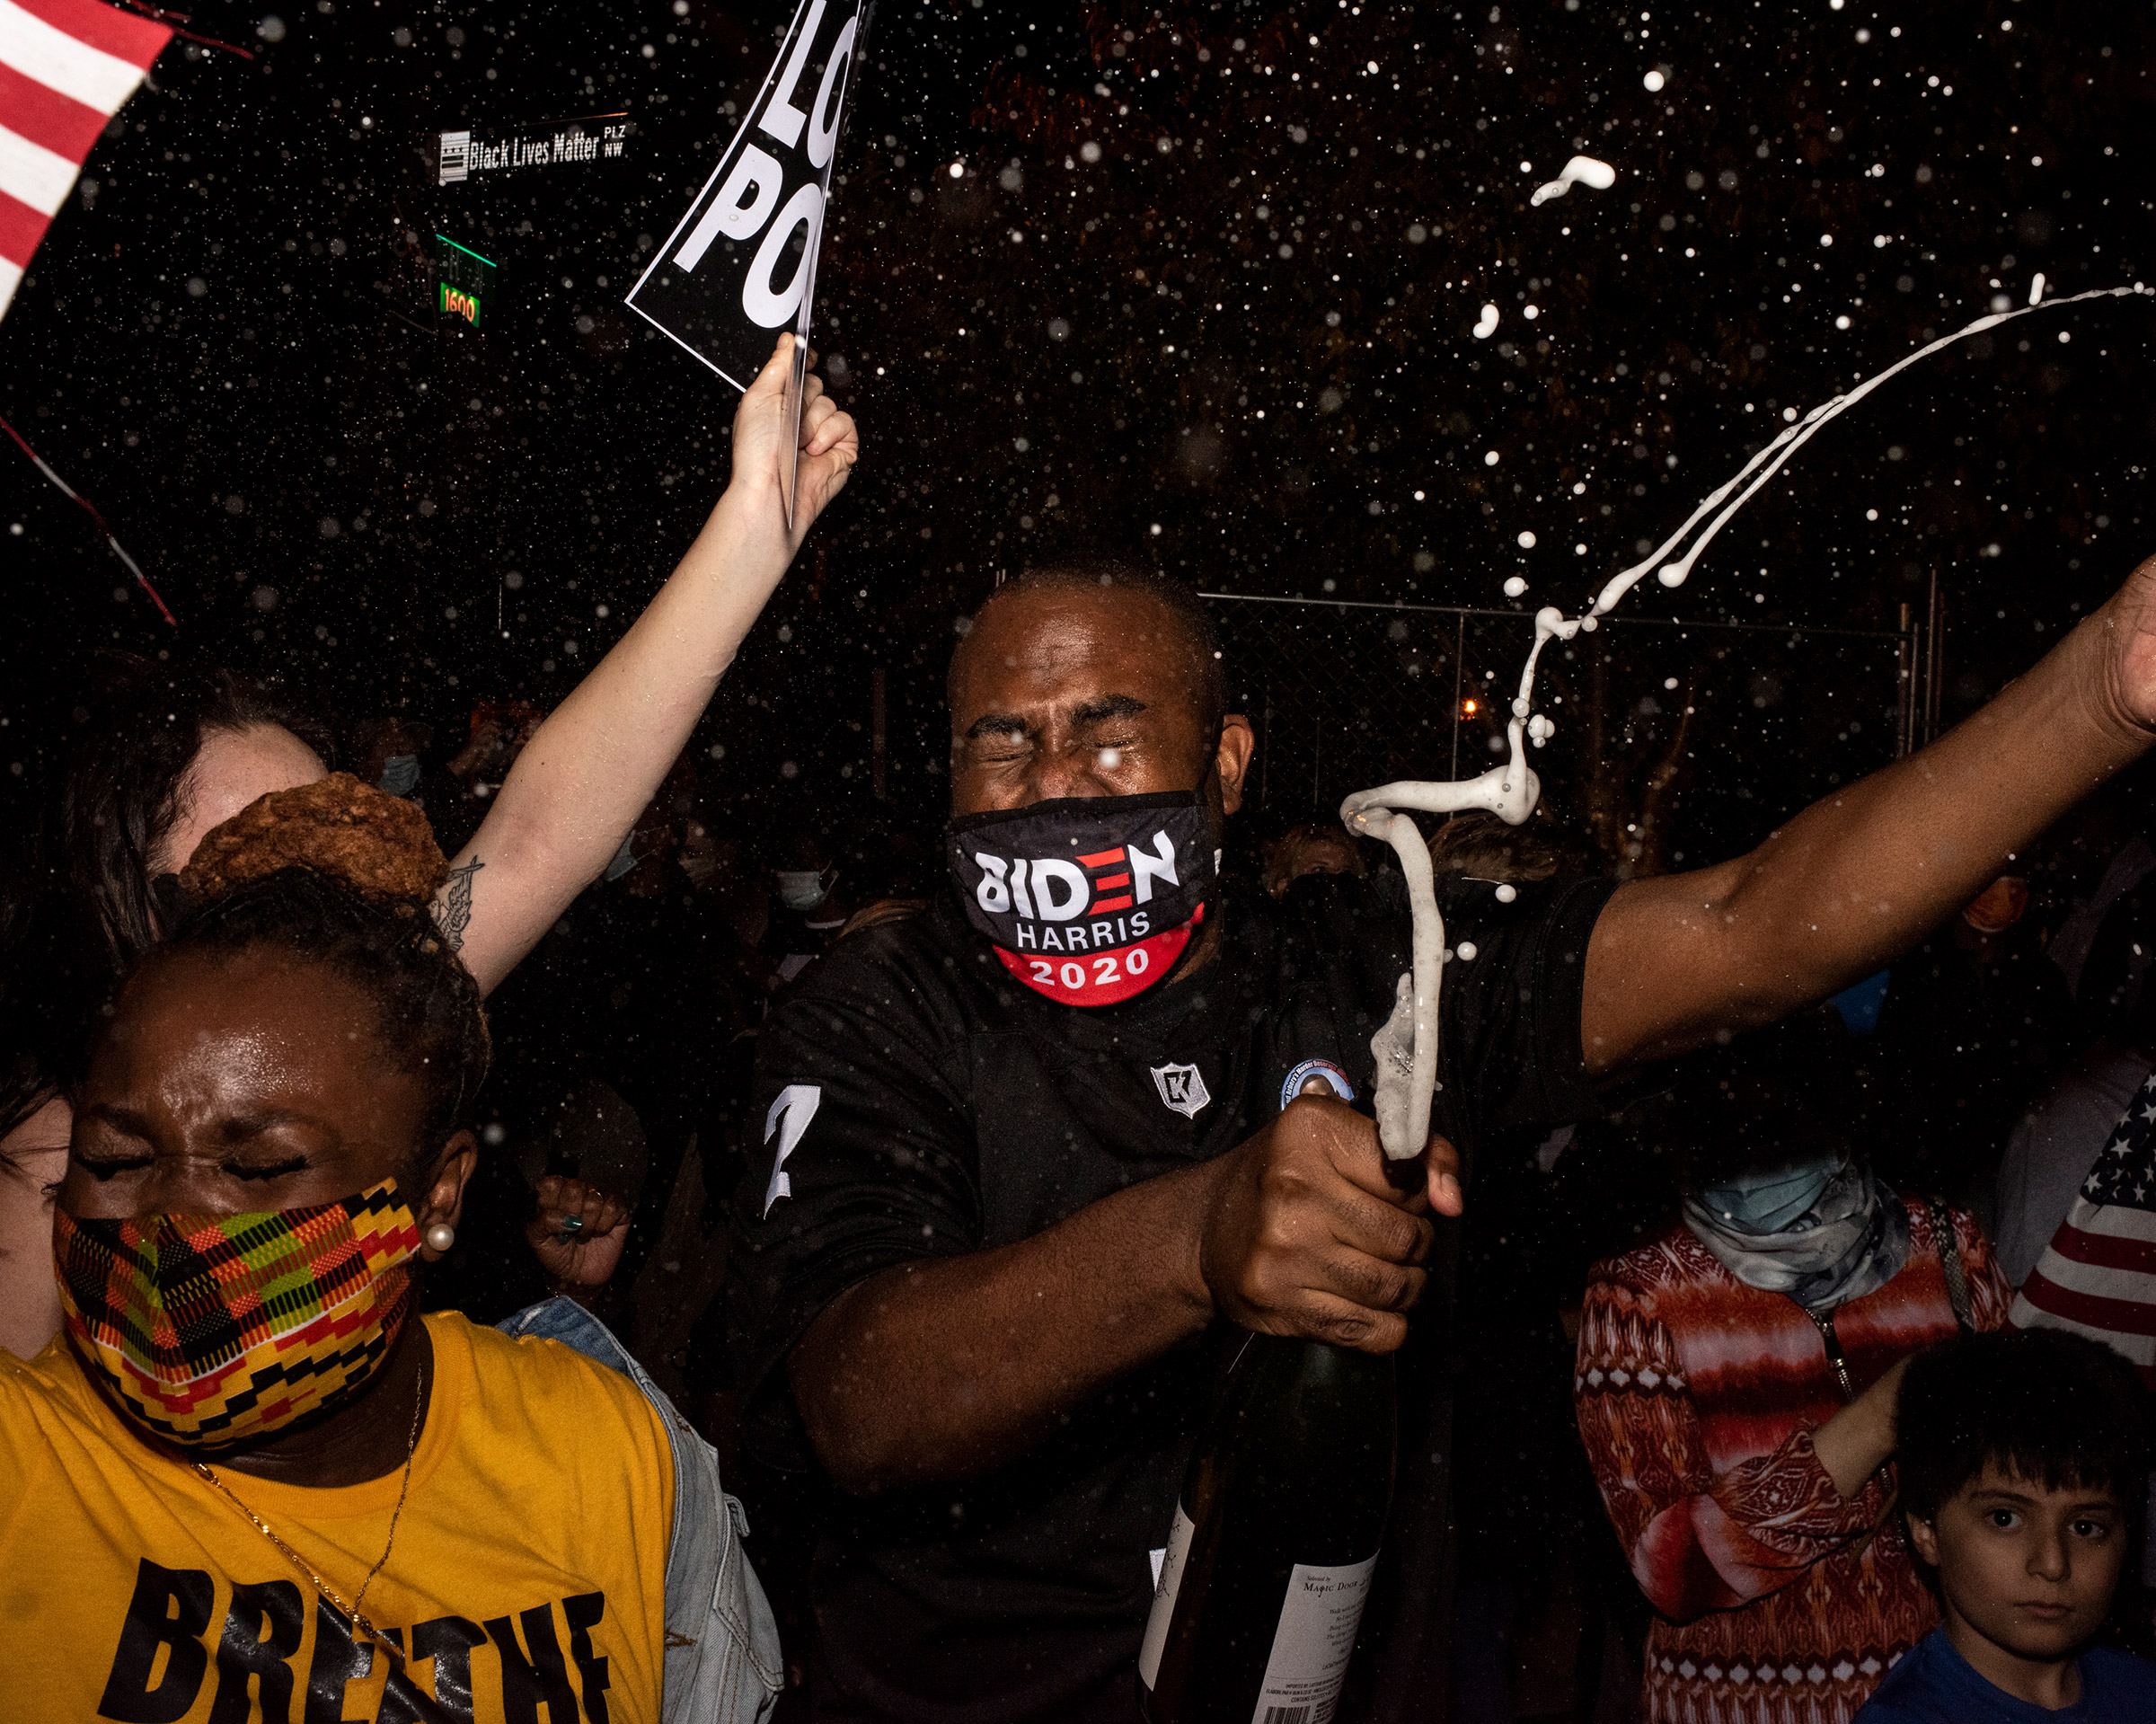 Biden-Harris supporters celebrate their win in Washington, D.C., on Nov. 7.